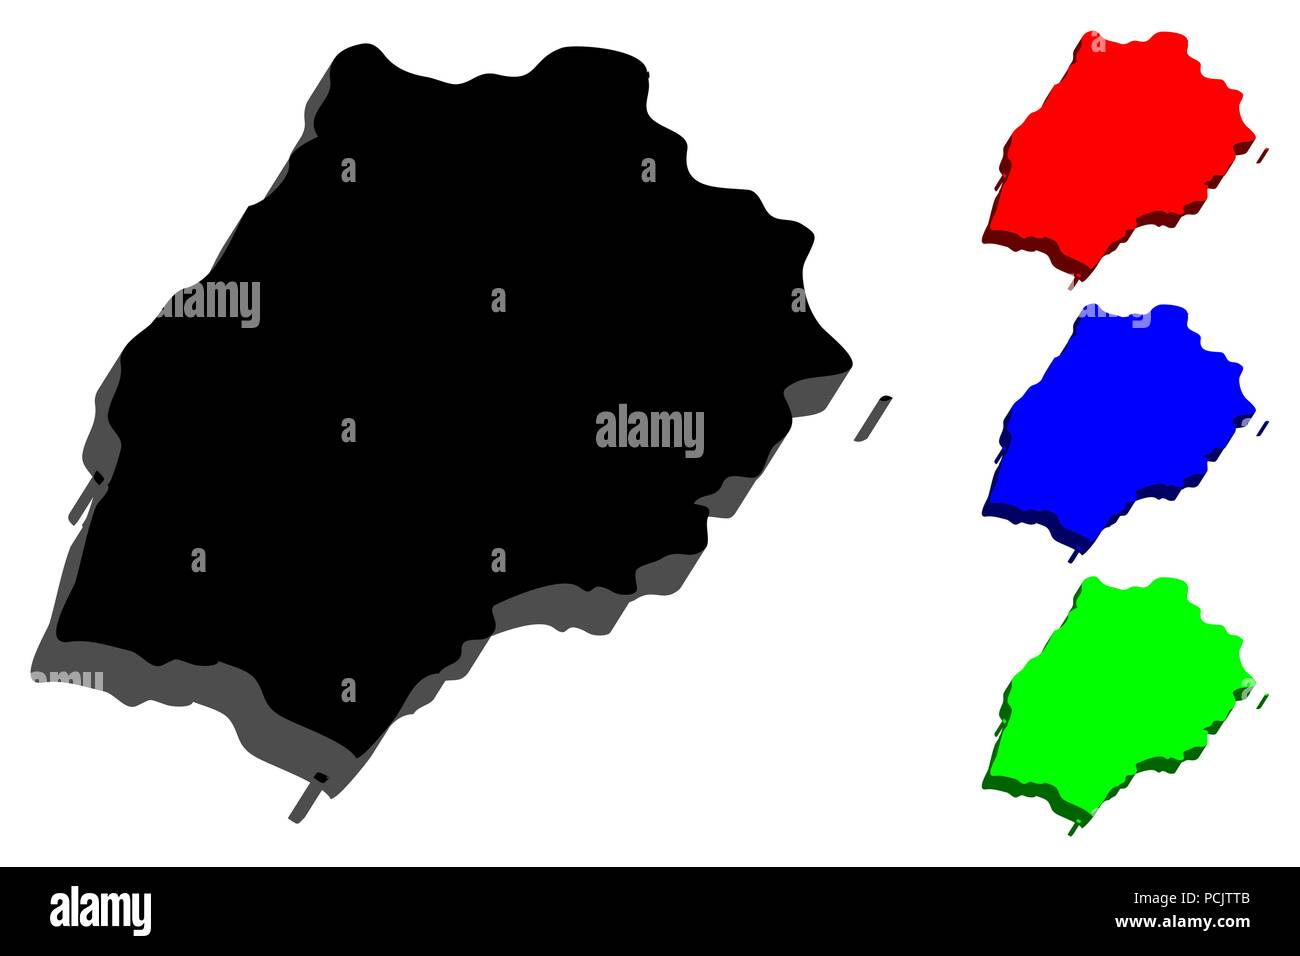 3D map of Saint Helena (British Overseas Territory) - black ... Saint Helena Map on st. johns river fishing map, dominican republic map, saint jerome map, tokelau map, south helena map, saint colorado springs map, seychelles map, helena street map, madeira map, reunion map, mayotte map, cape verde map, samoa map, senegal map, tensas map, st. helena california map, saint michael map, mozambique map, nauru map, tuvalu map,